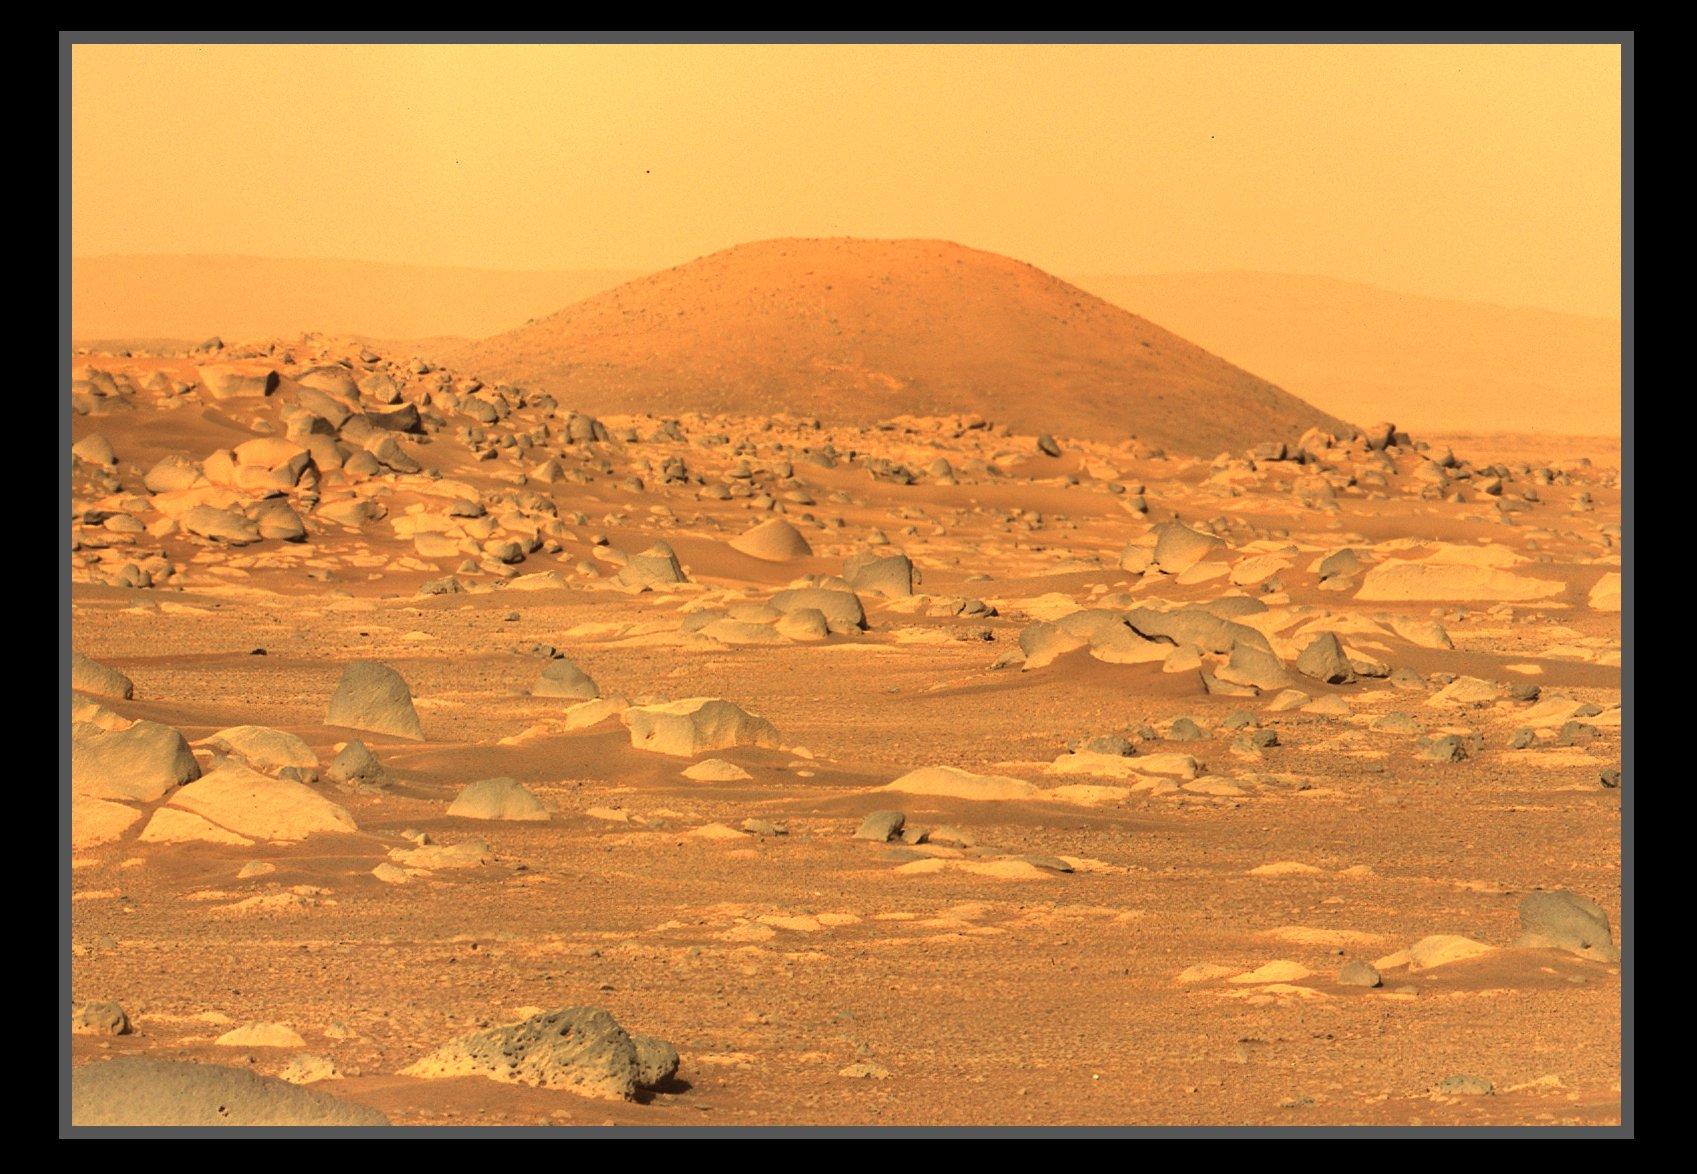 Mars 2020 (Perseverance) : exploration du cratère Jezero - Page 7 EyAB_EoWQAUnN4c?format=jpg&name=large